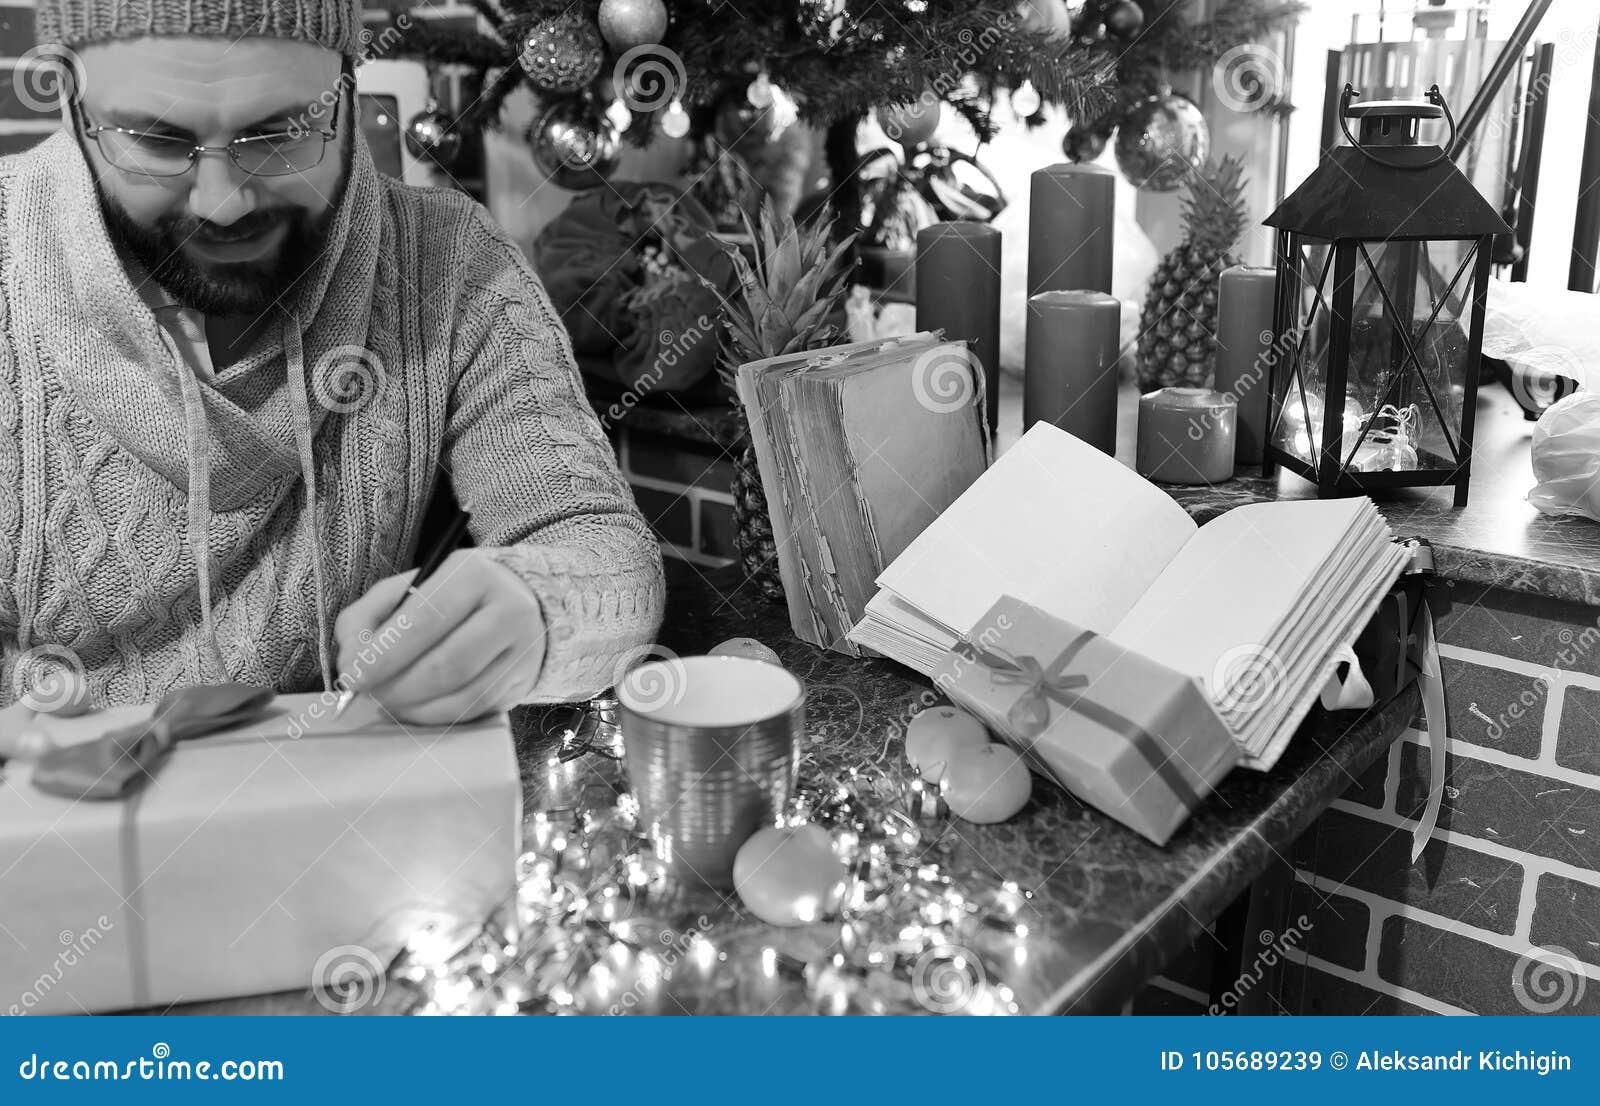 Monochrome Beard Man Writing Christmas Gifts On A Table Stock Image ...